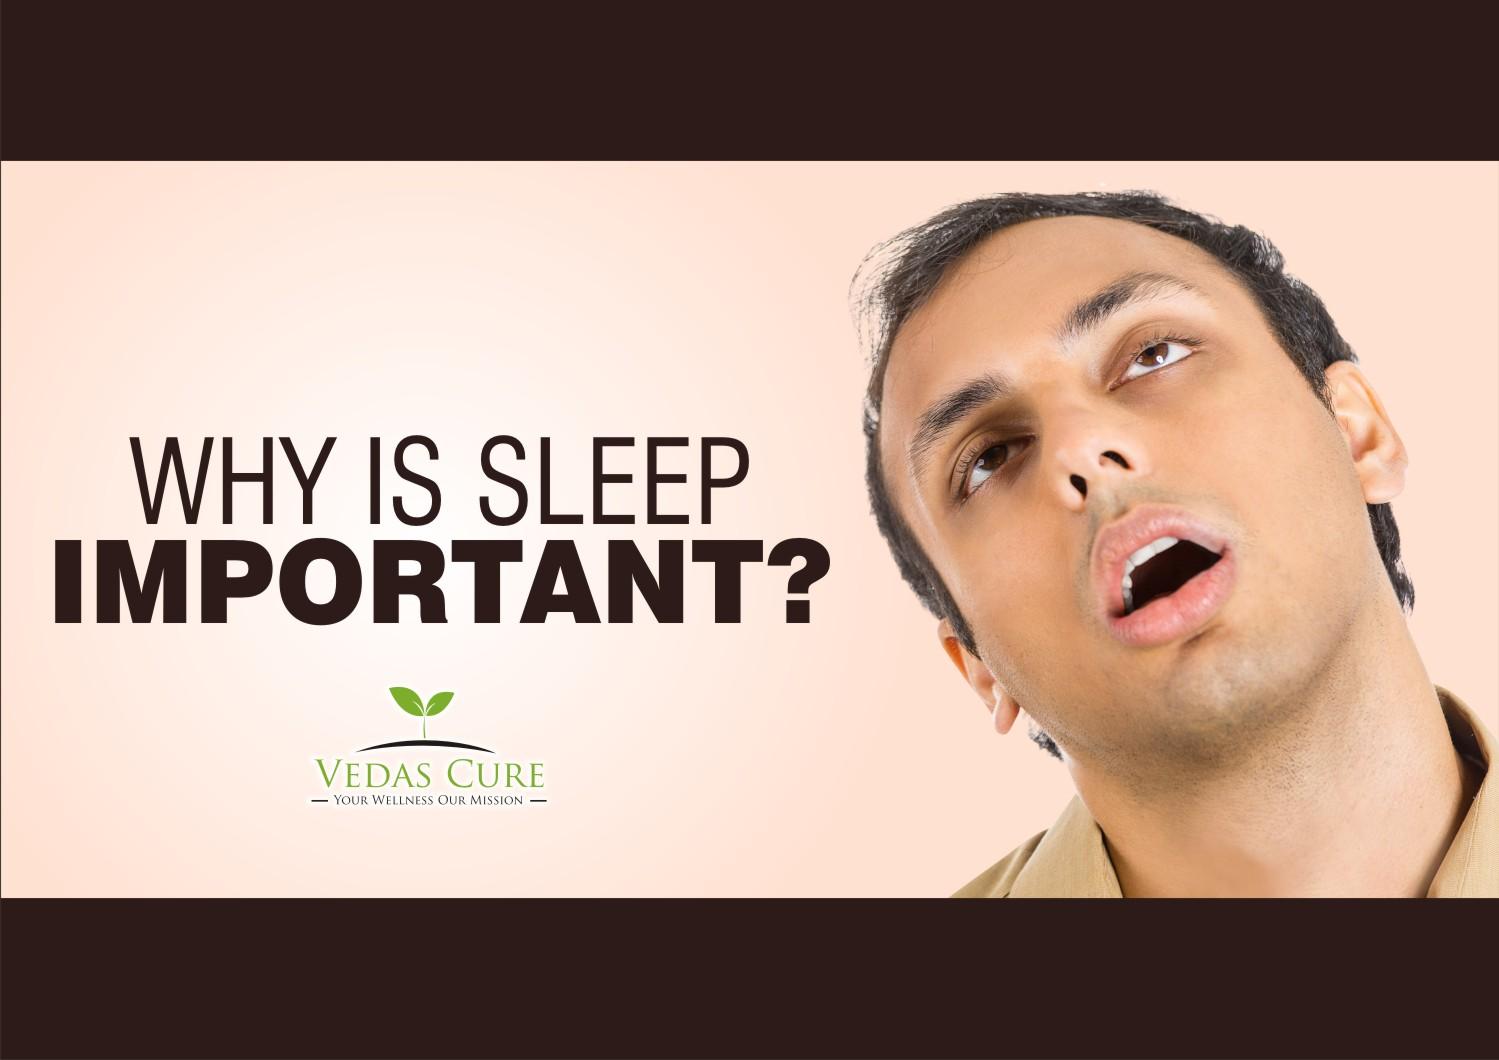 006 Essay Example Importance Of Sleep Why Is Breathtaking Pdf Spm Speech Full